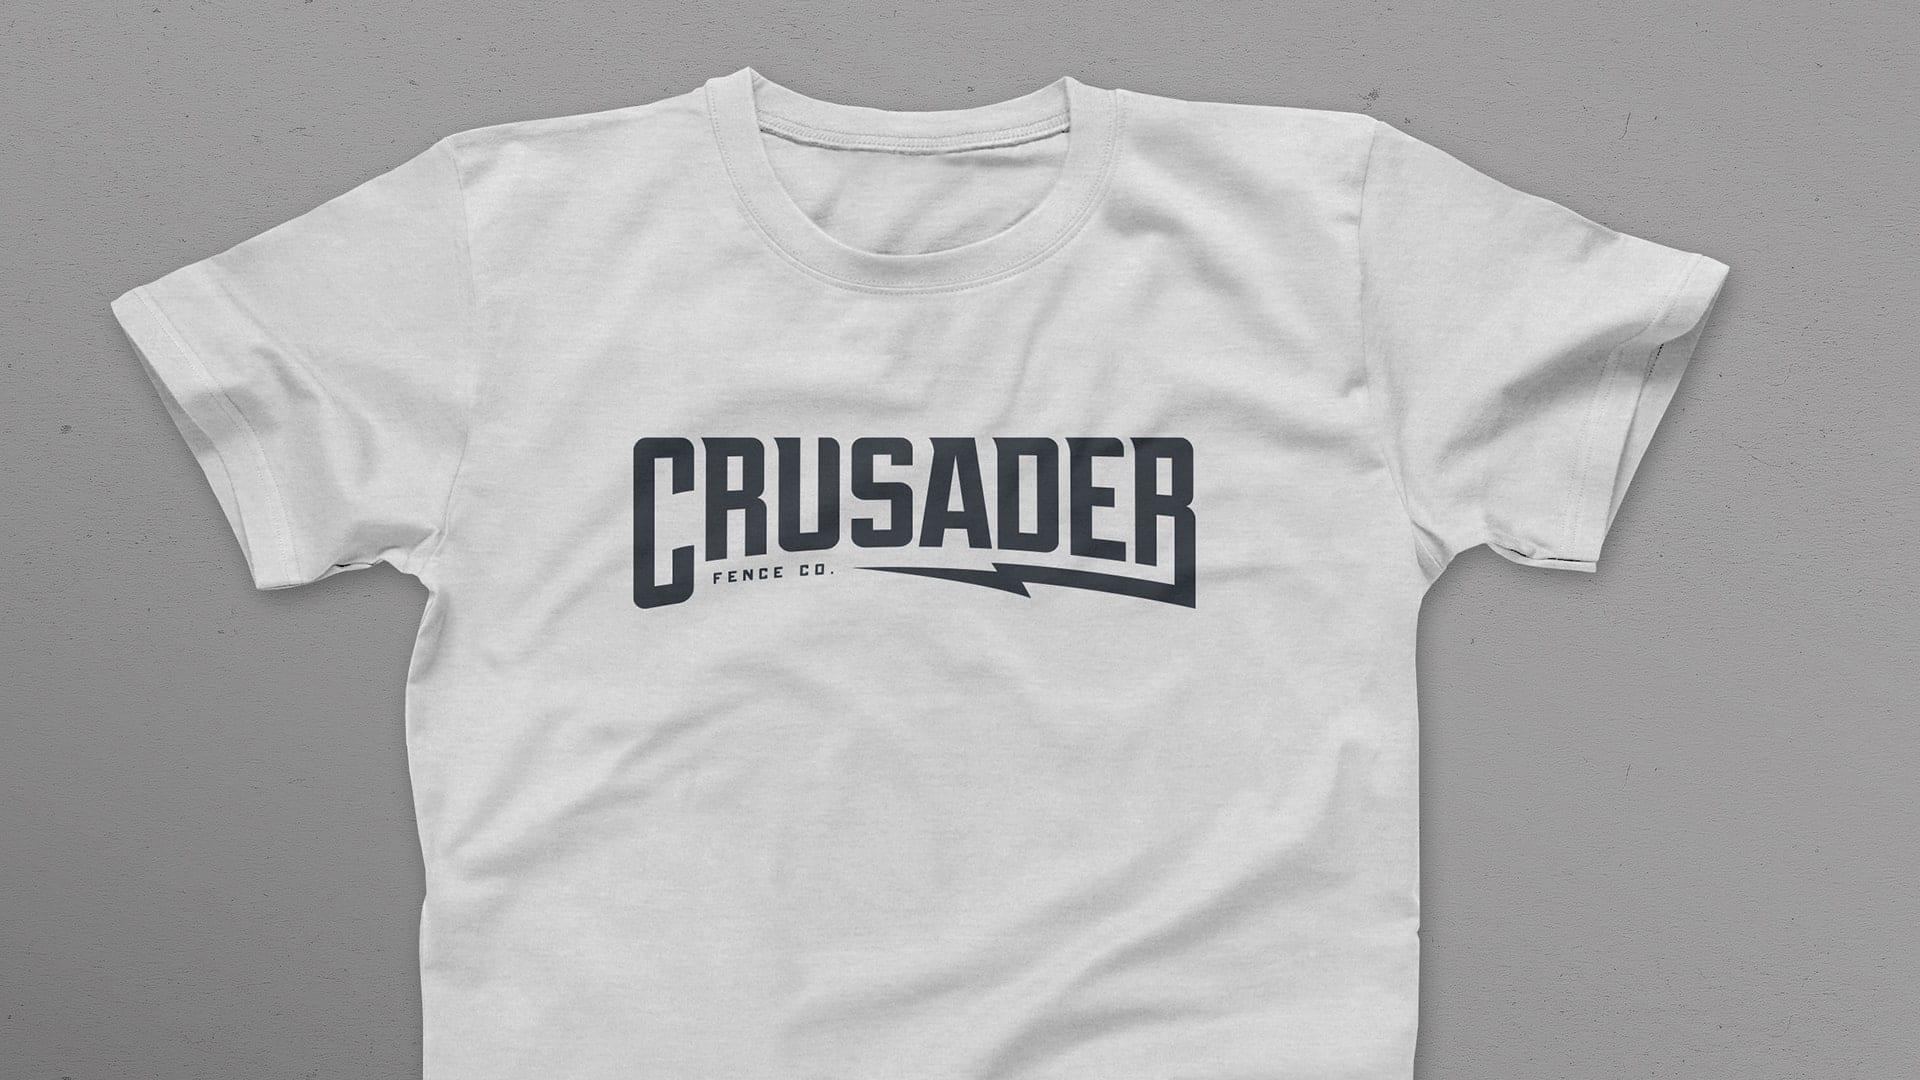 Crusader Fence Company T-shirt design